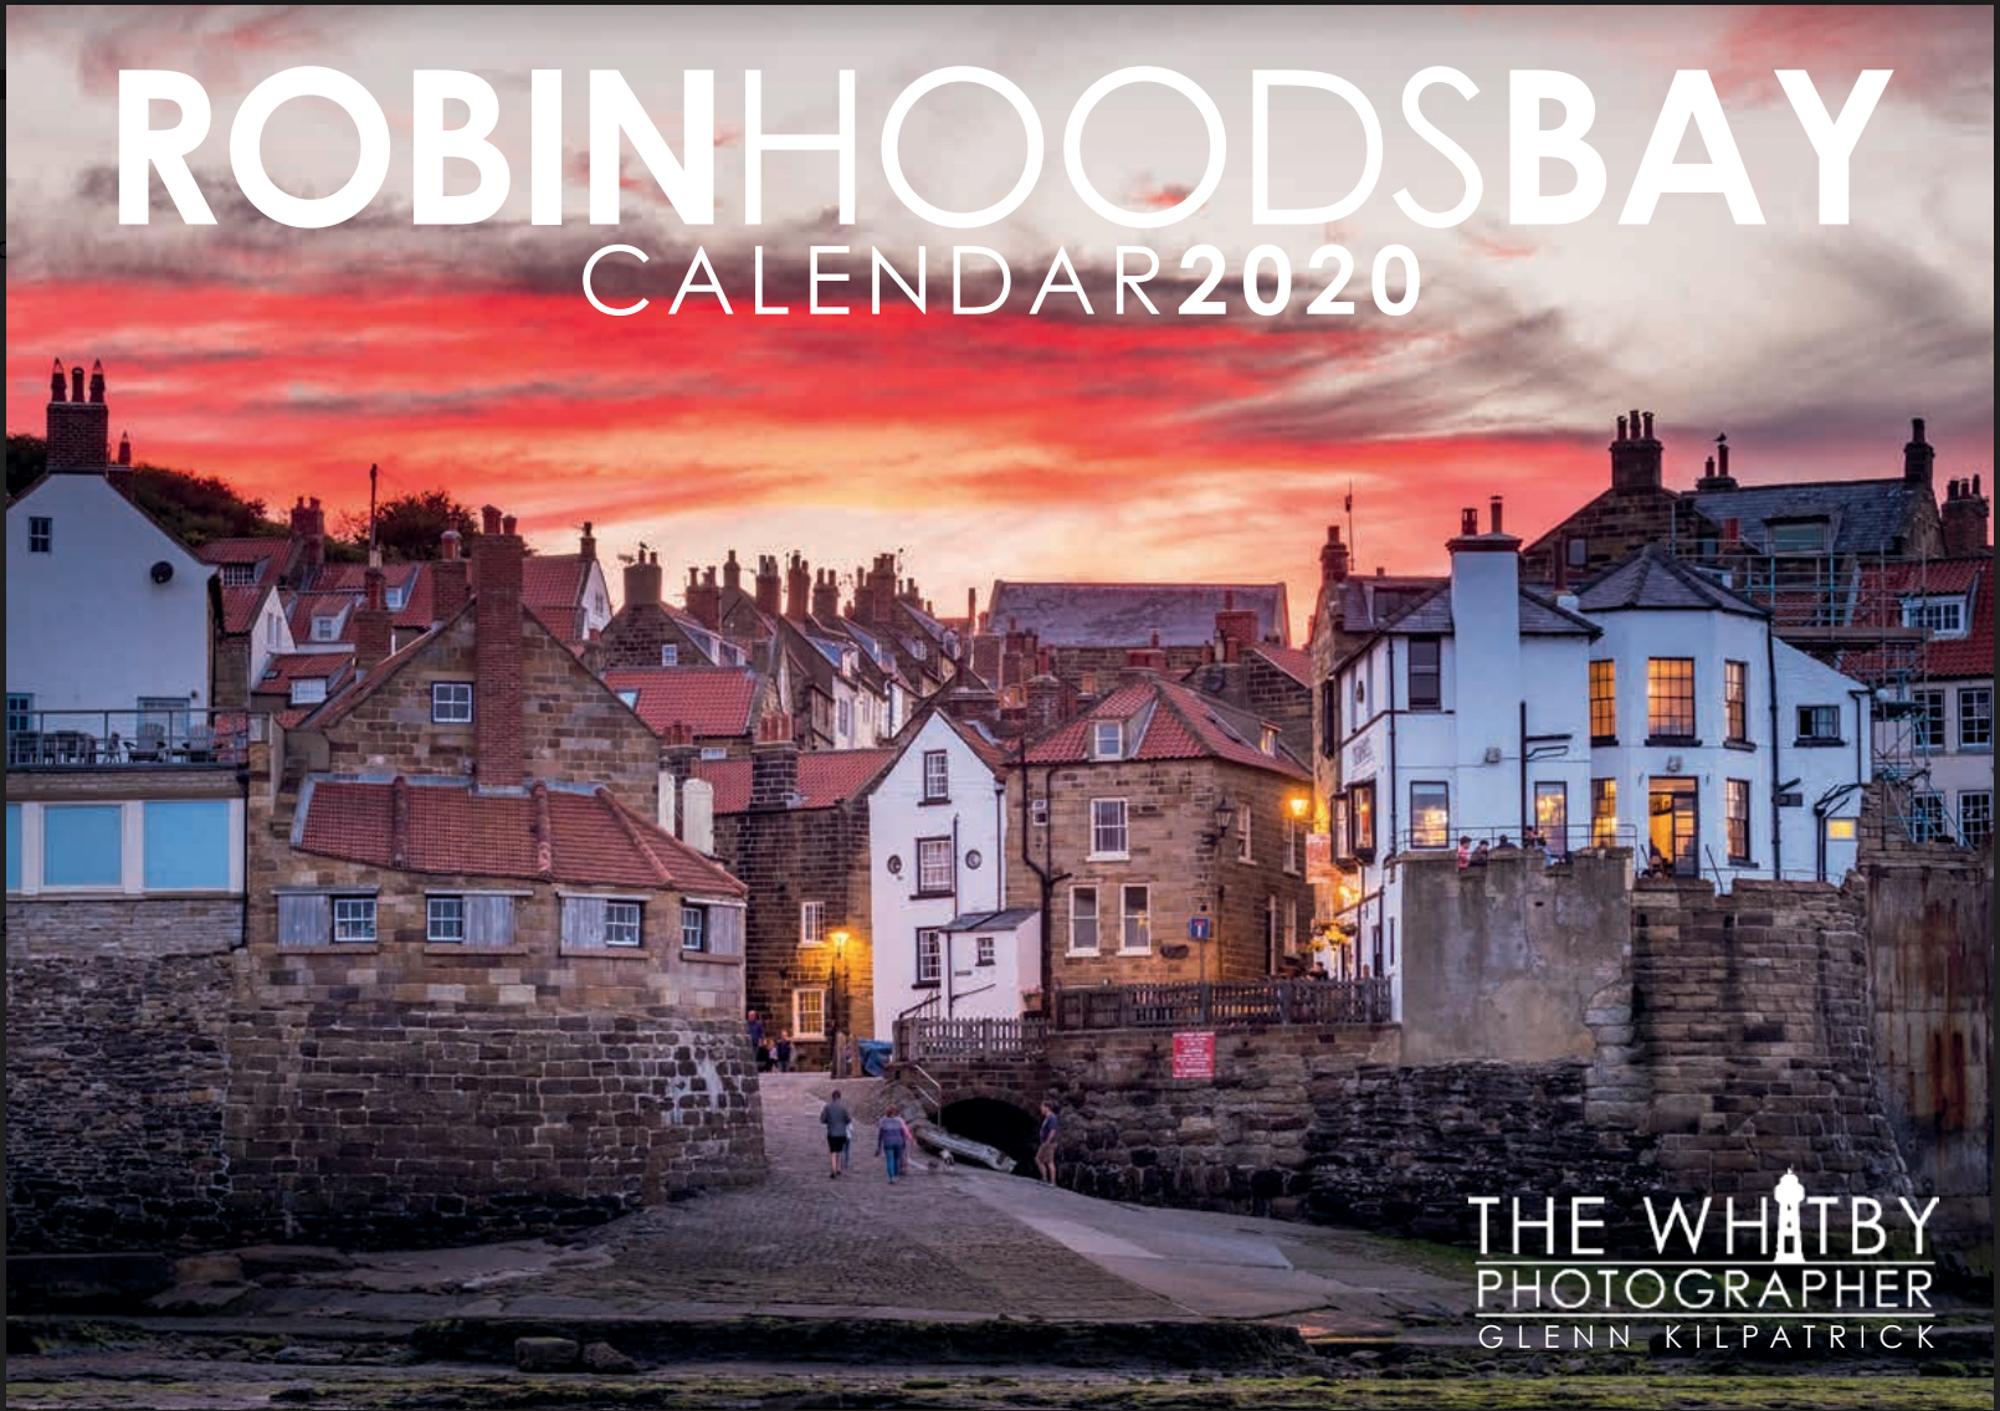 Robin Hoods Bay Calendar 2020